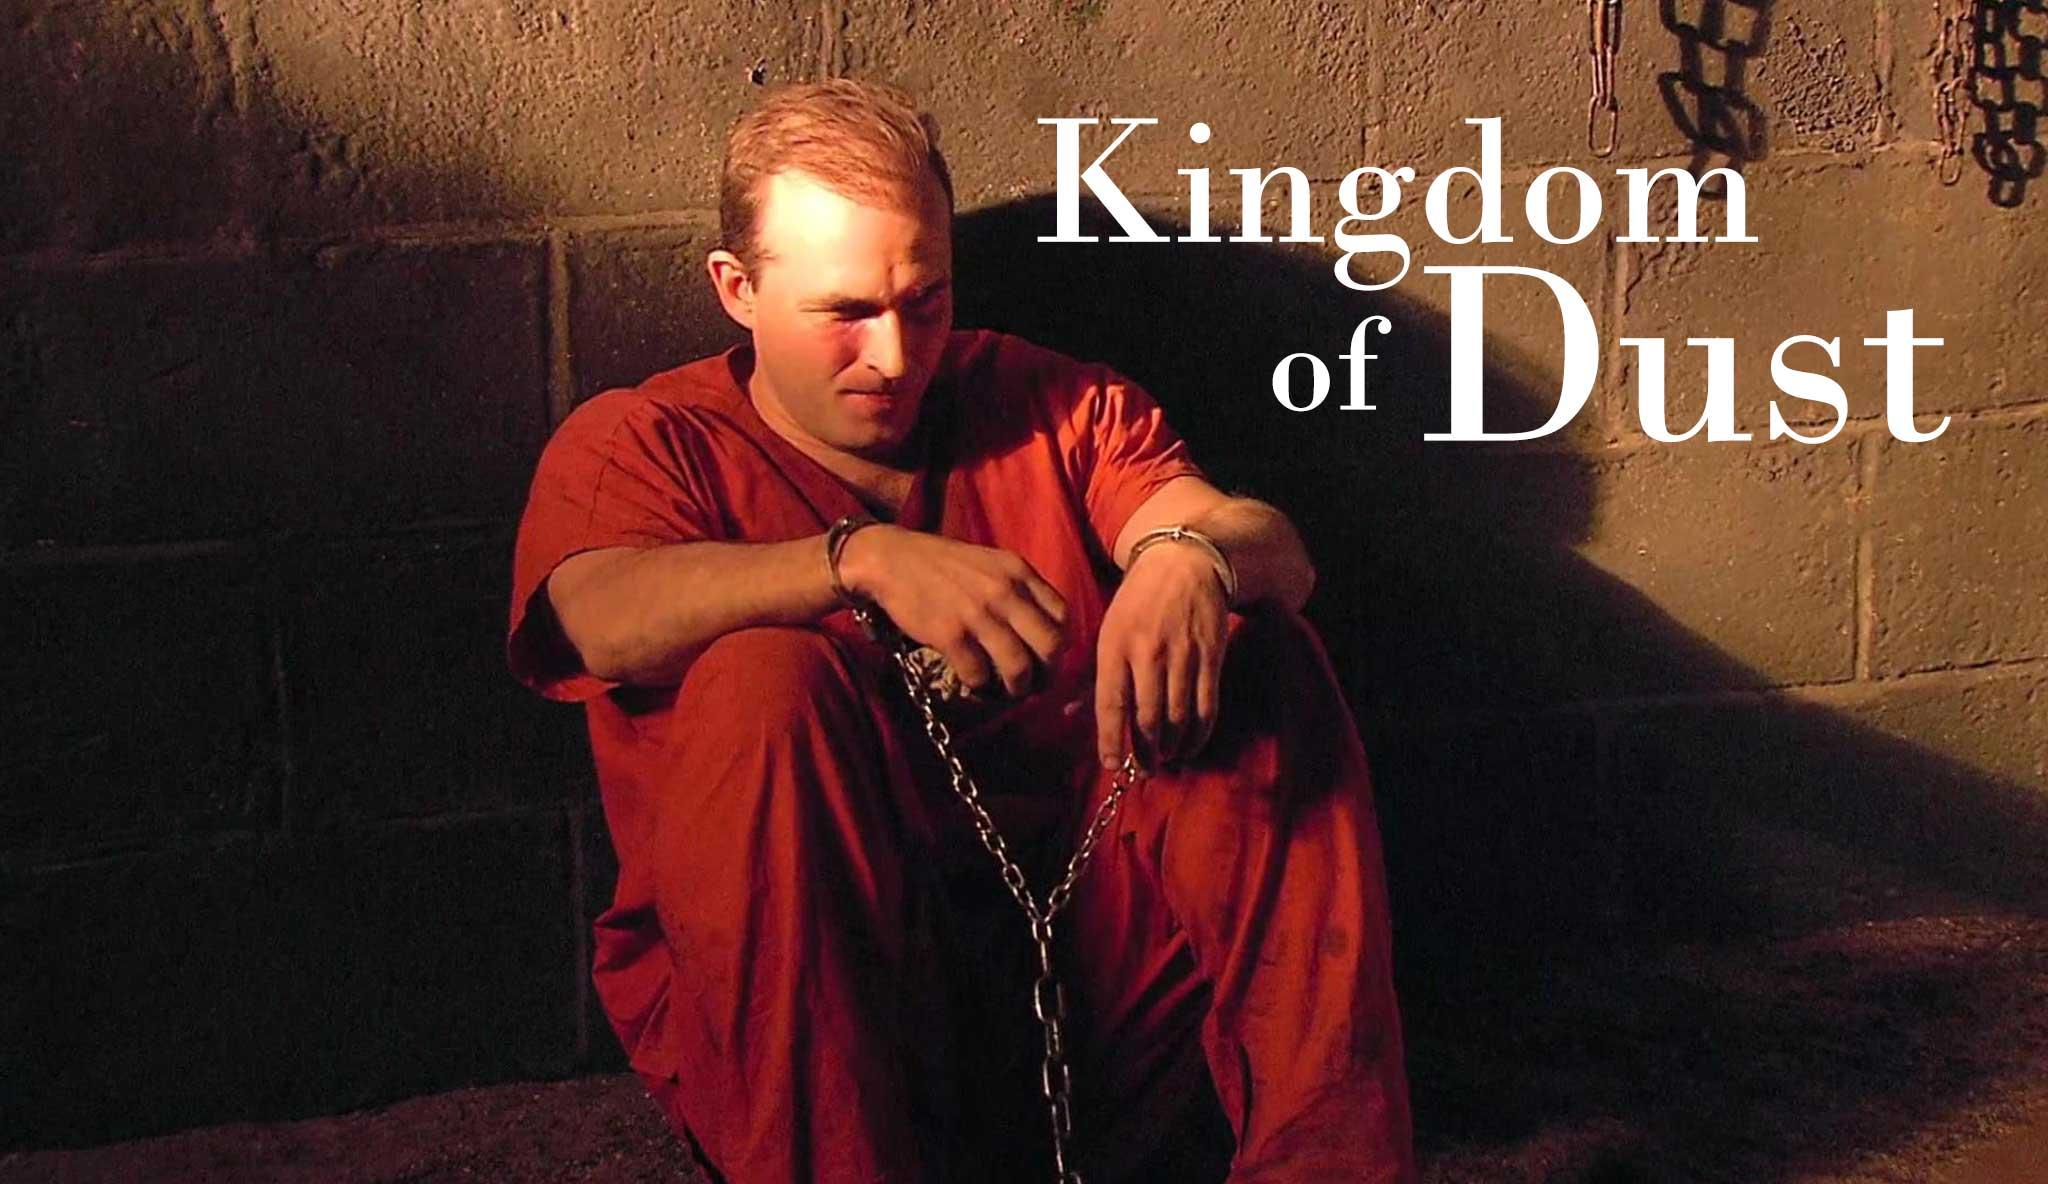 kingdom-of-dust\header.jpg